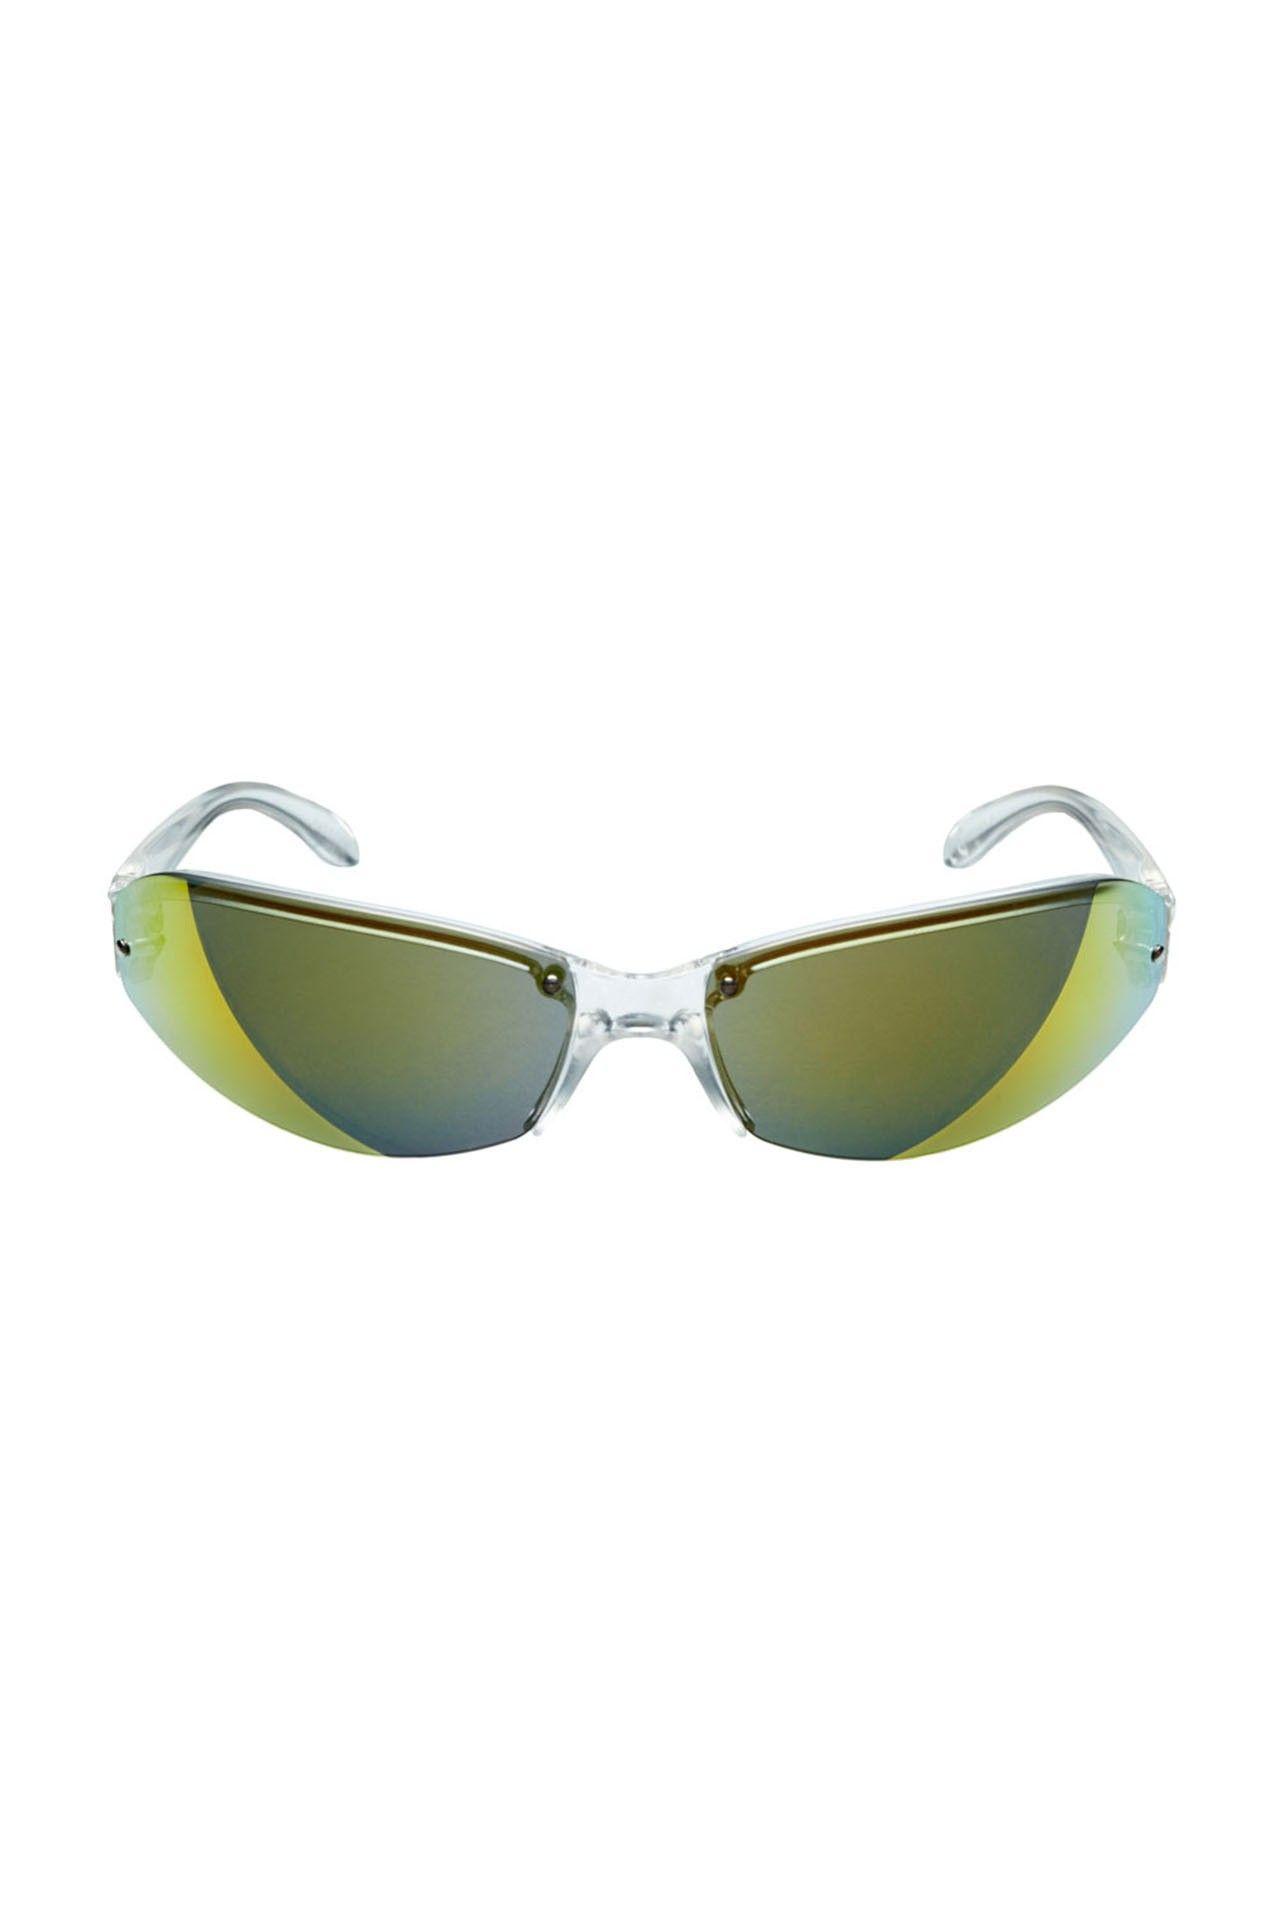 Afbeelding van Icon Eyewear Zonnebril 40097 Clear C